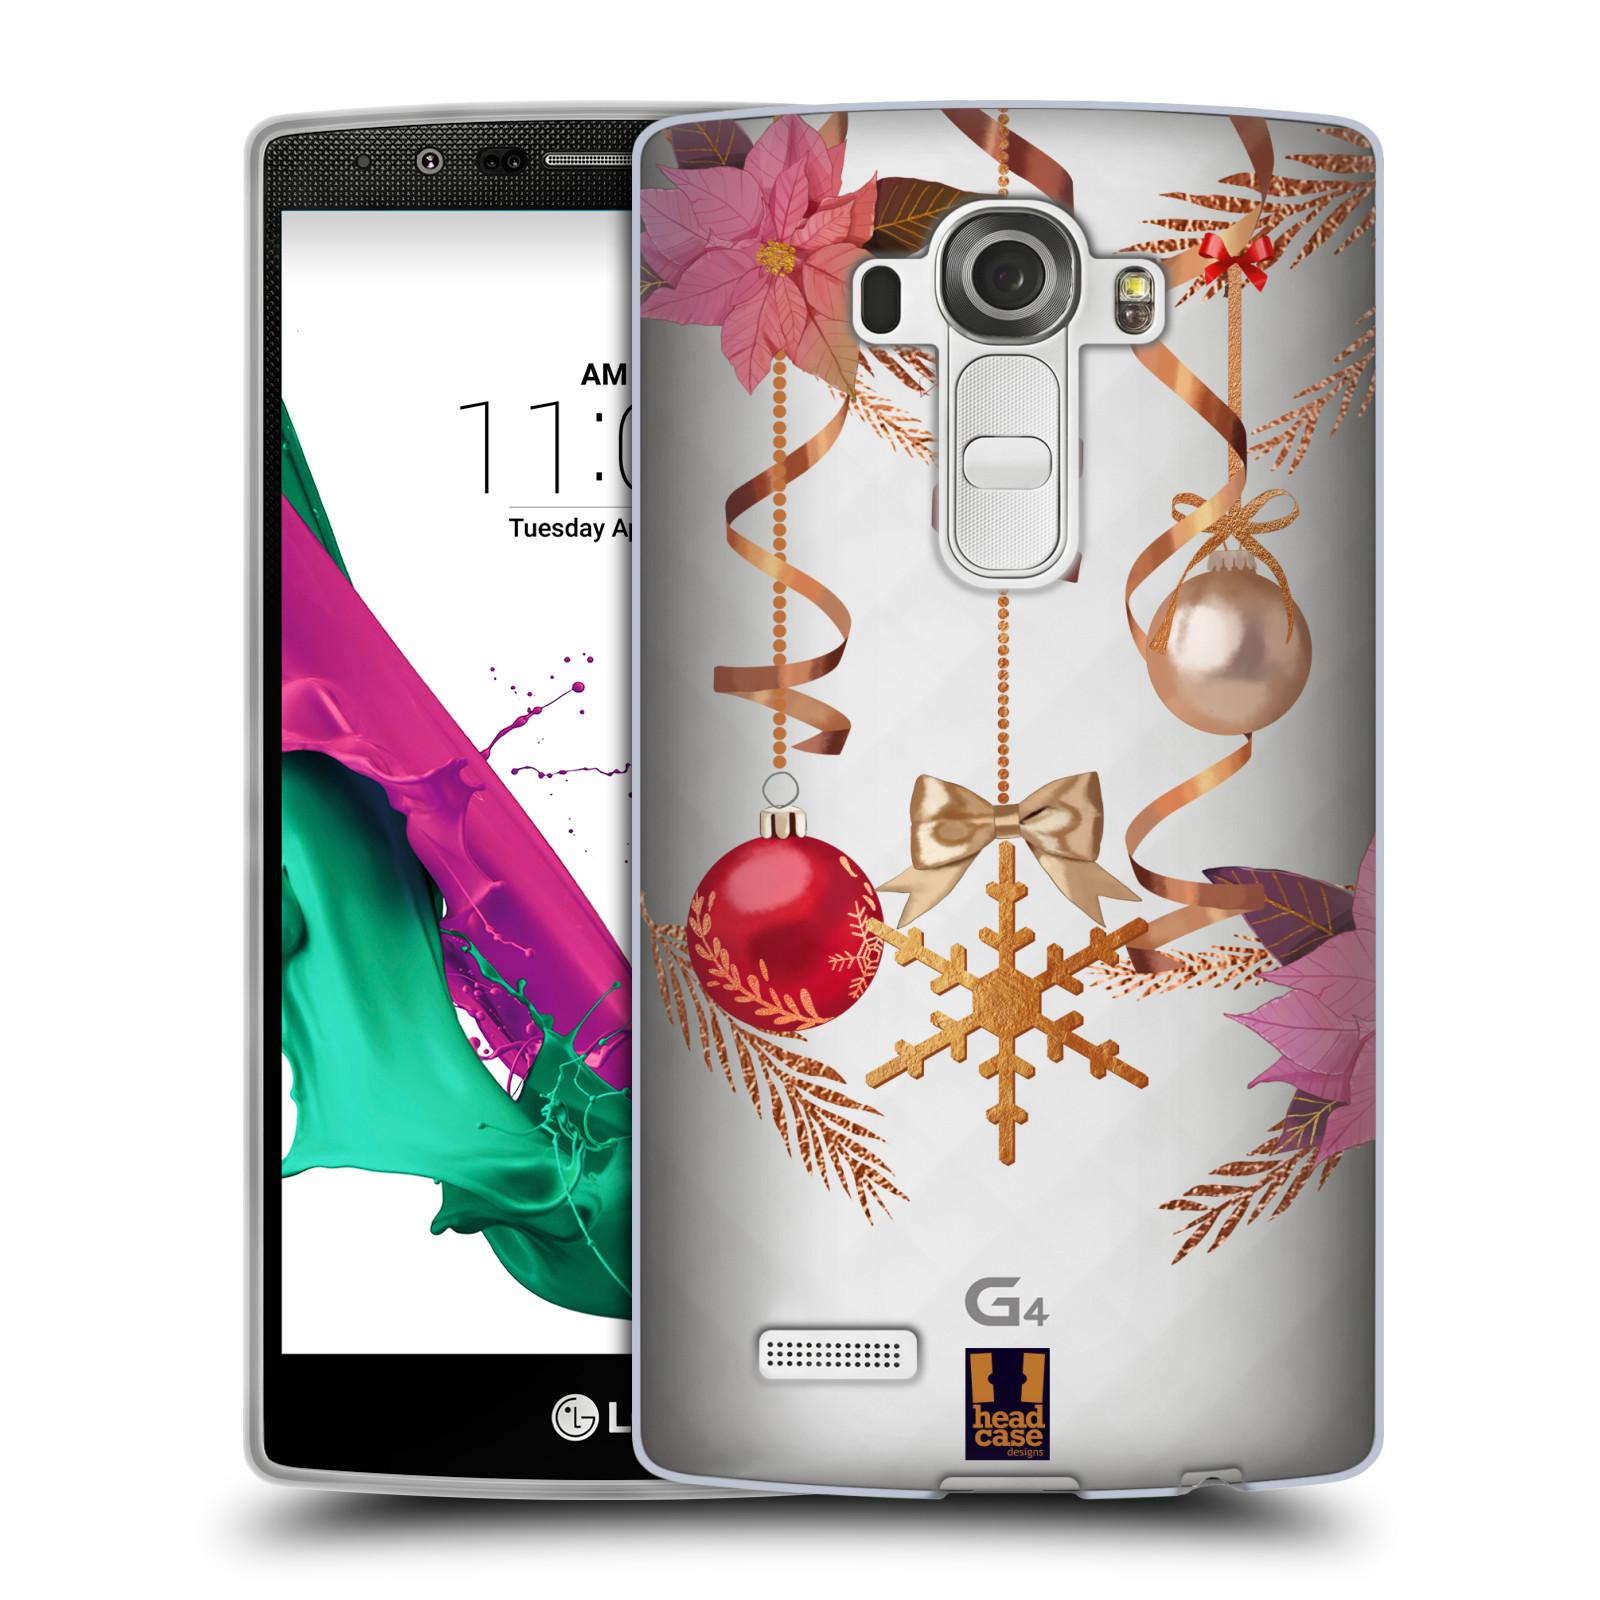 Silikonové pouzdro na mobil LG G4 - Head Case - Vločka a vánoční ozdoby